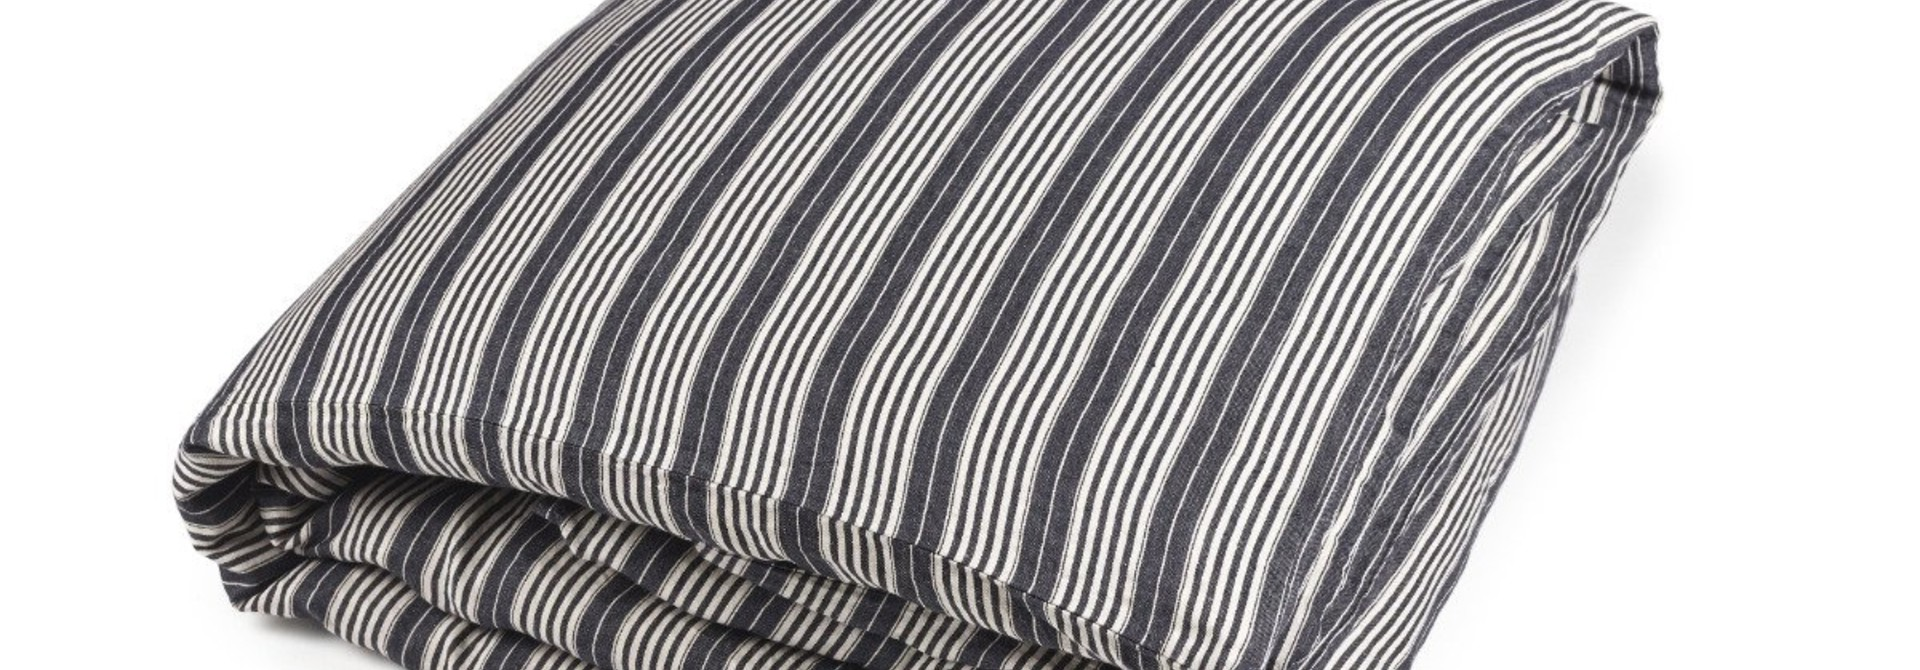 Duvet Cover - The Tack Stripe